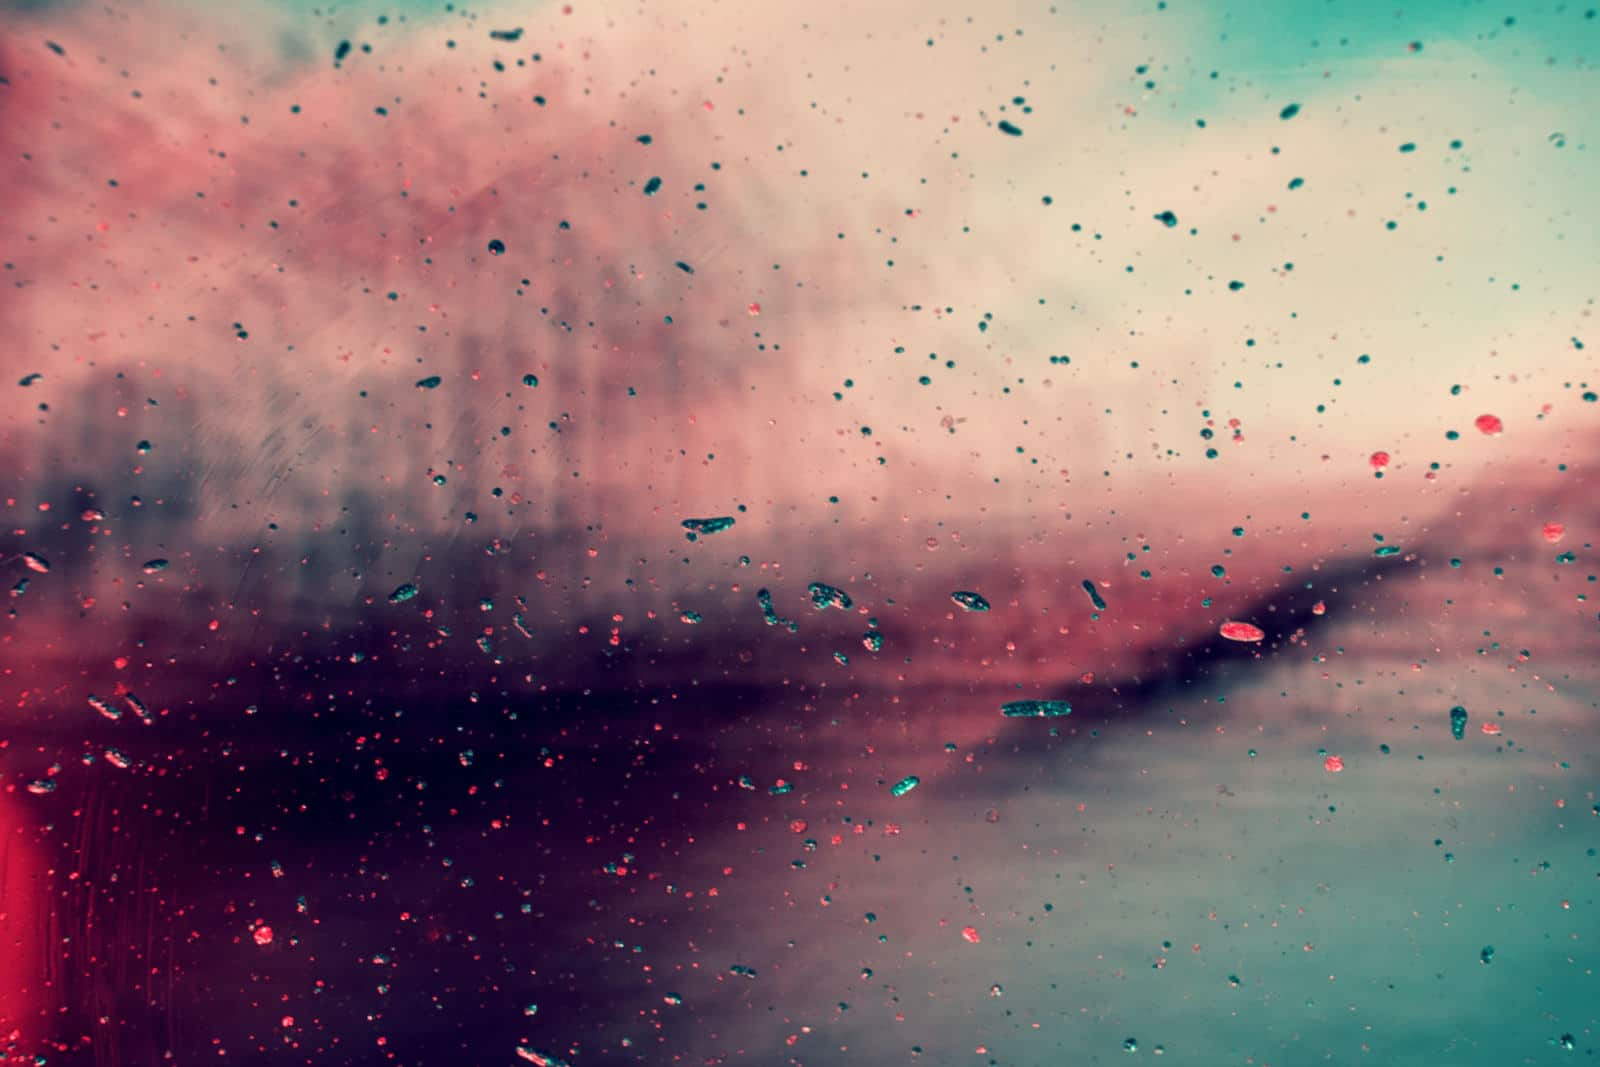 pink and blue splash